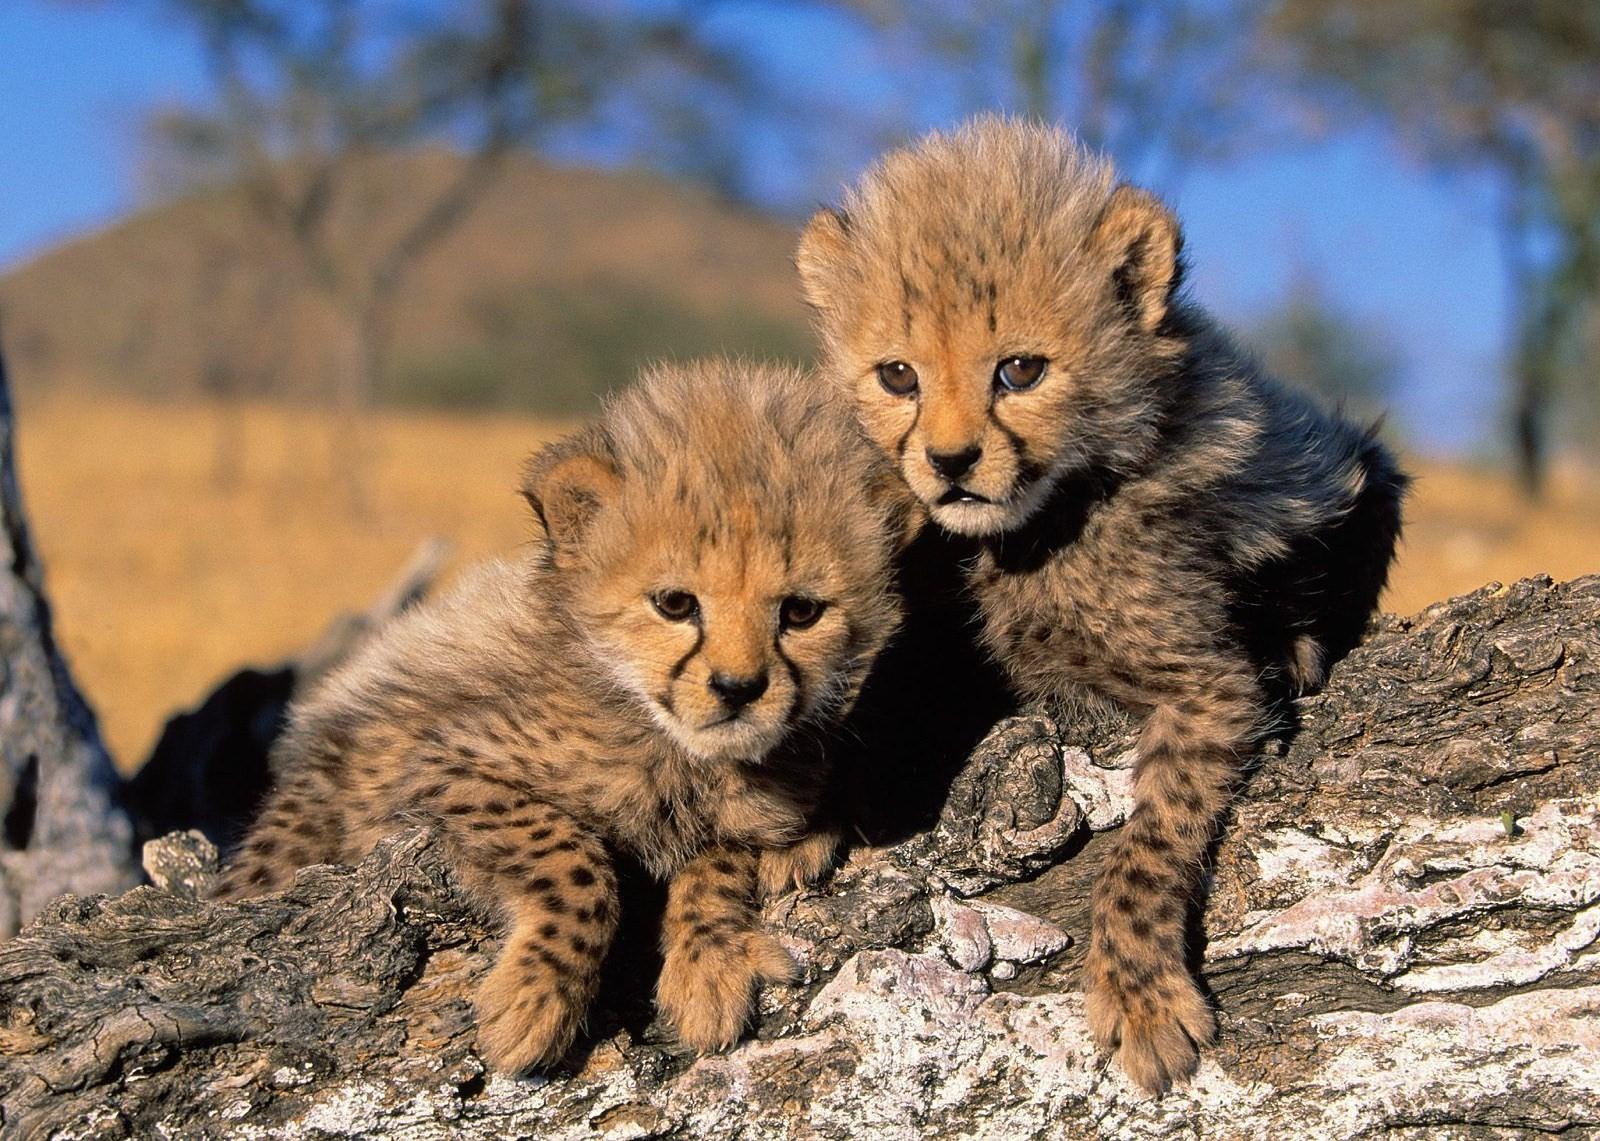 Cute cheetah wallpaper wallpapersafari edge of the plank cute animals baby cheetah cubs 1600x1141 voltagebd Image collections